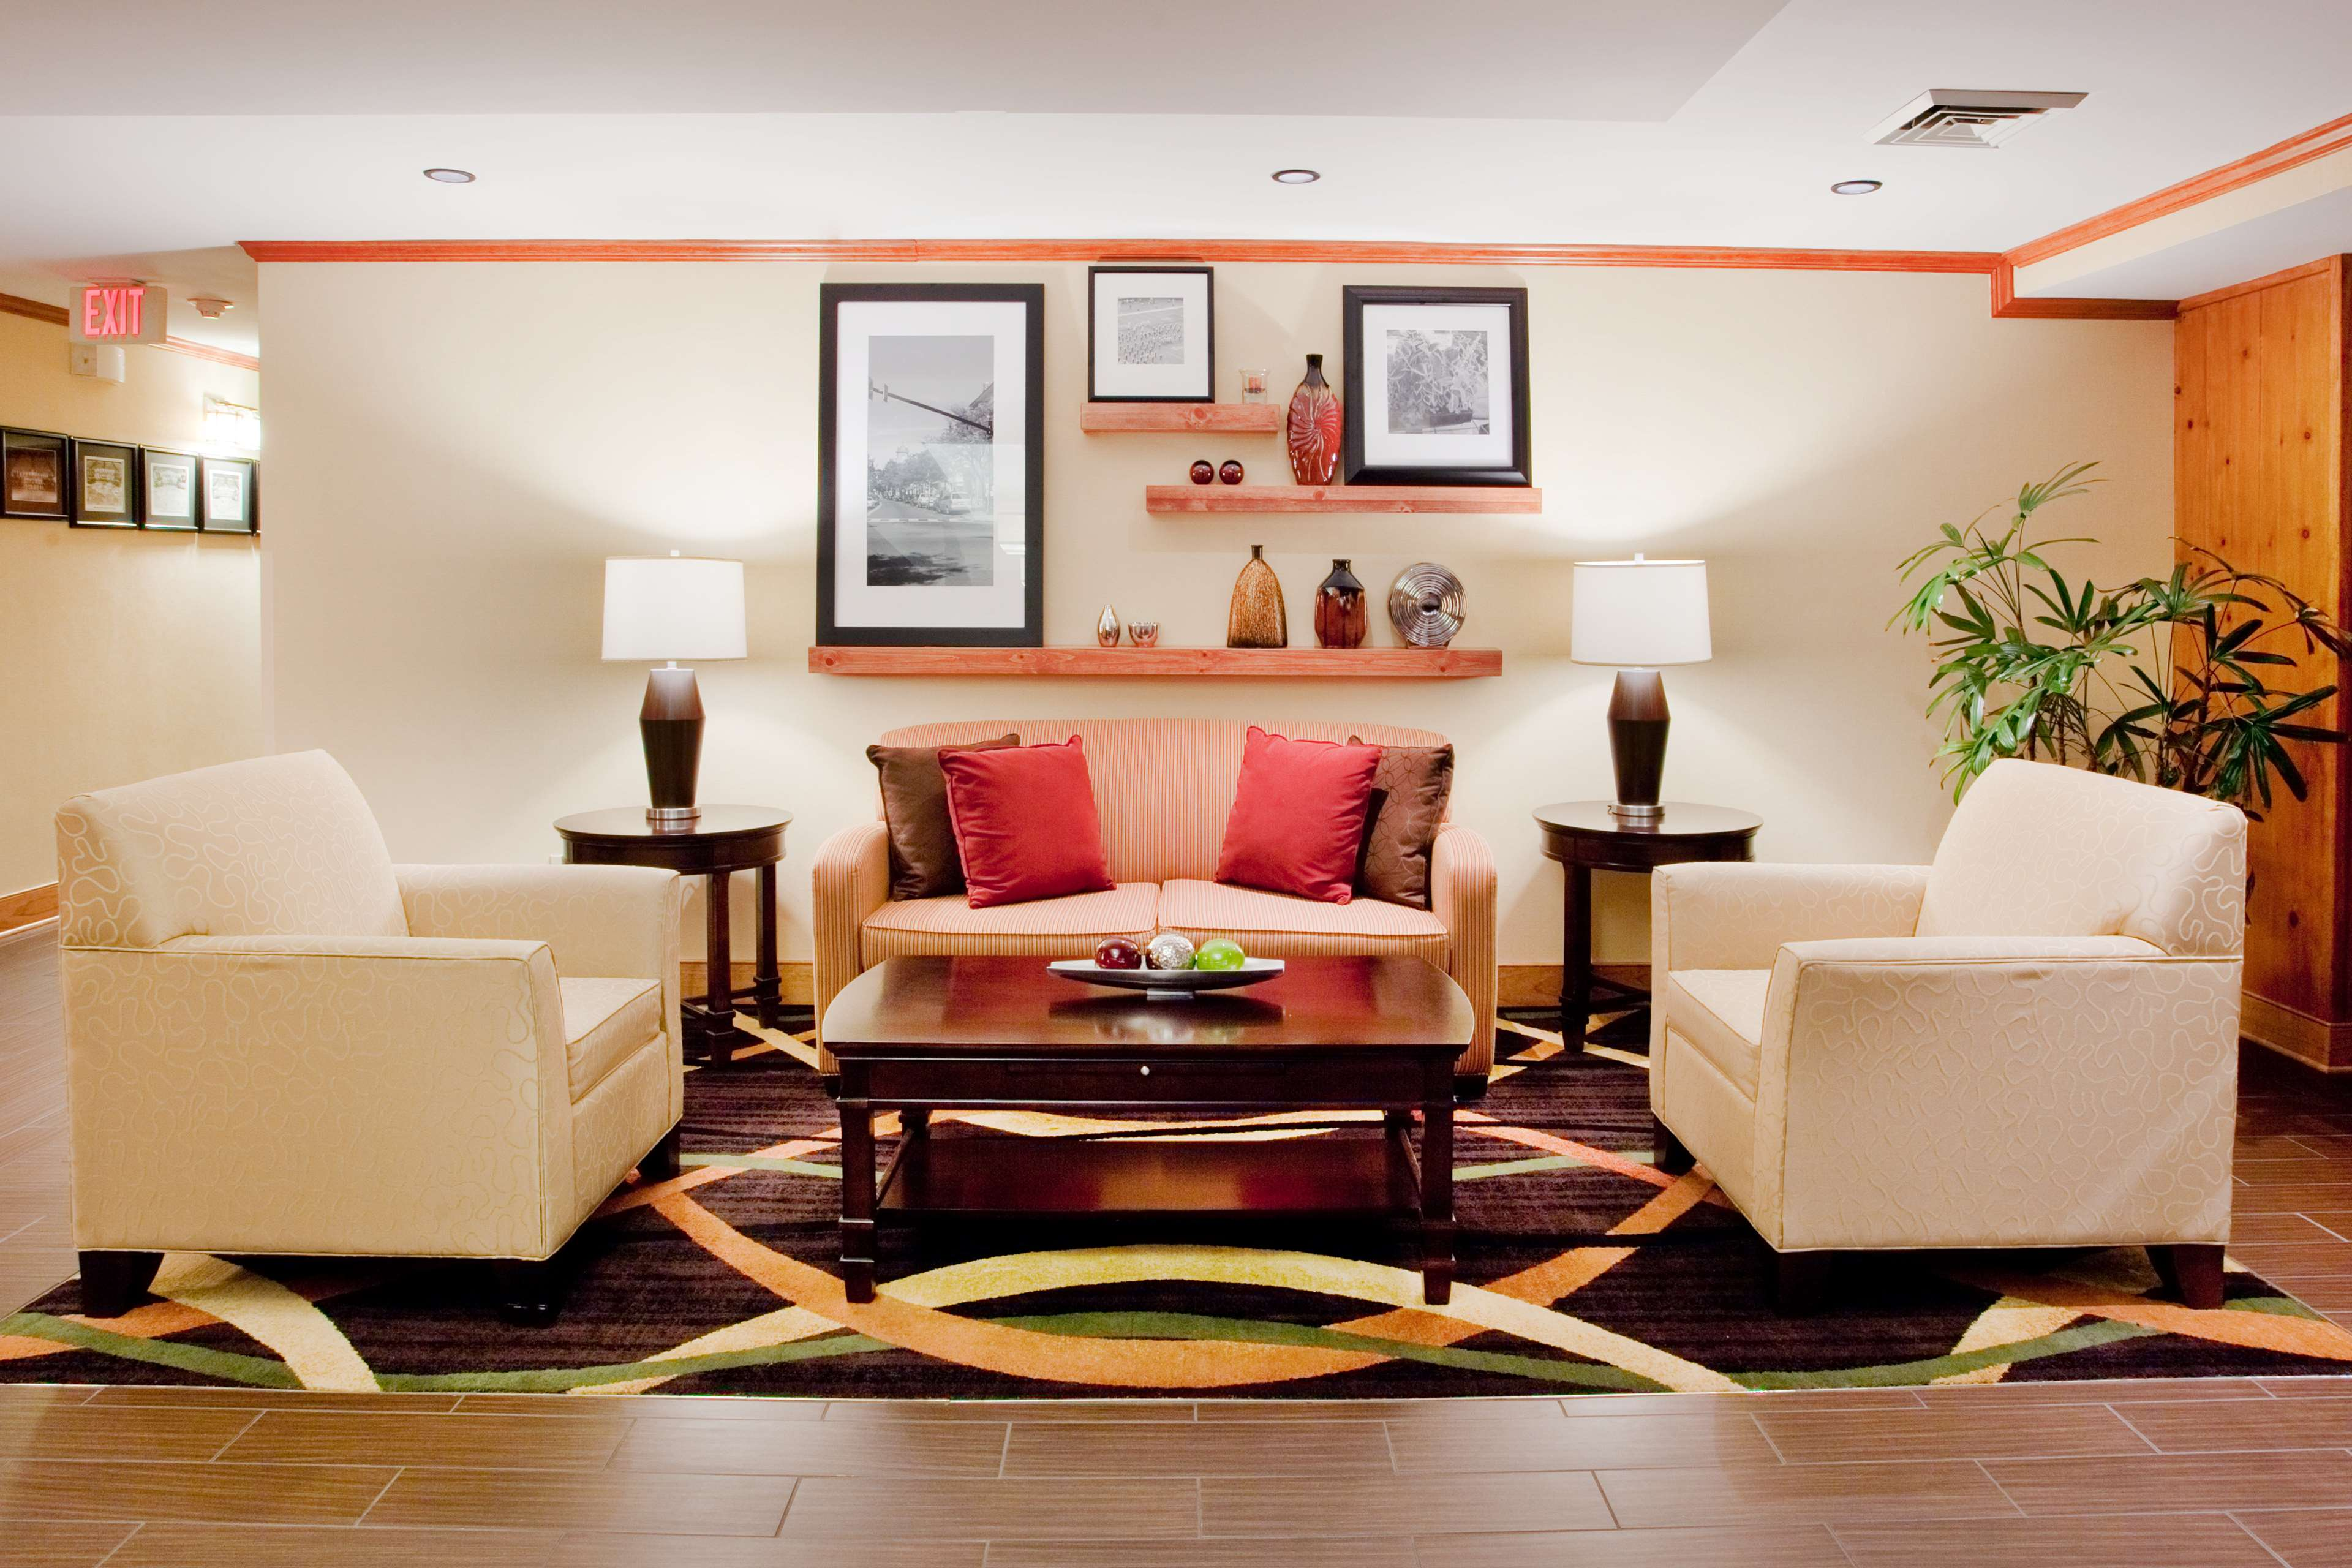 Hampton Inn & Suites Chapel Hill/Durham, Area image 2